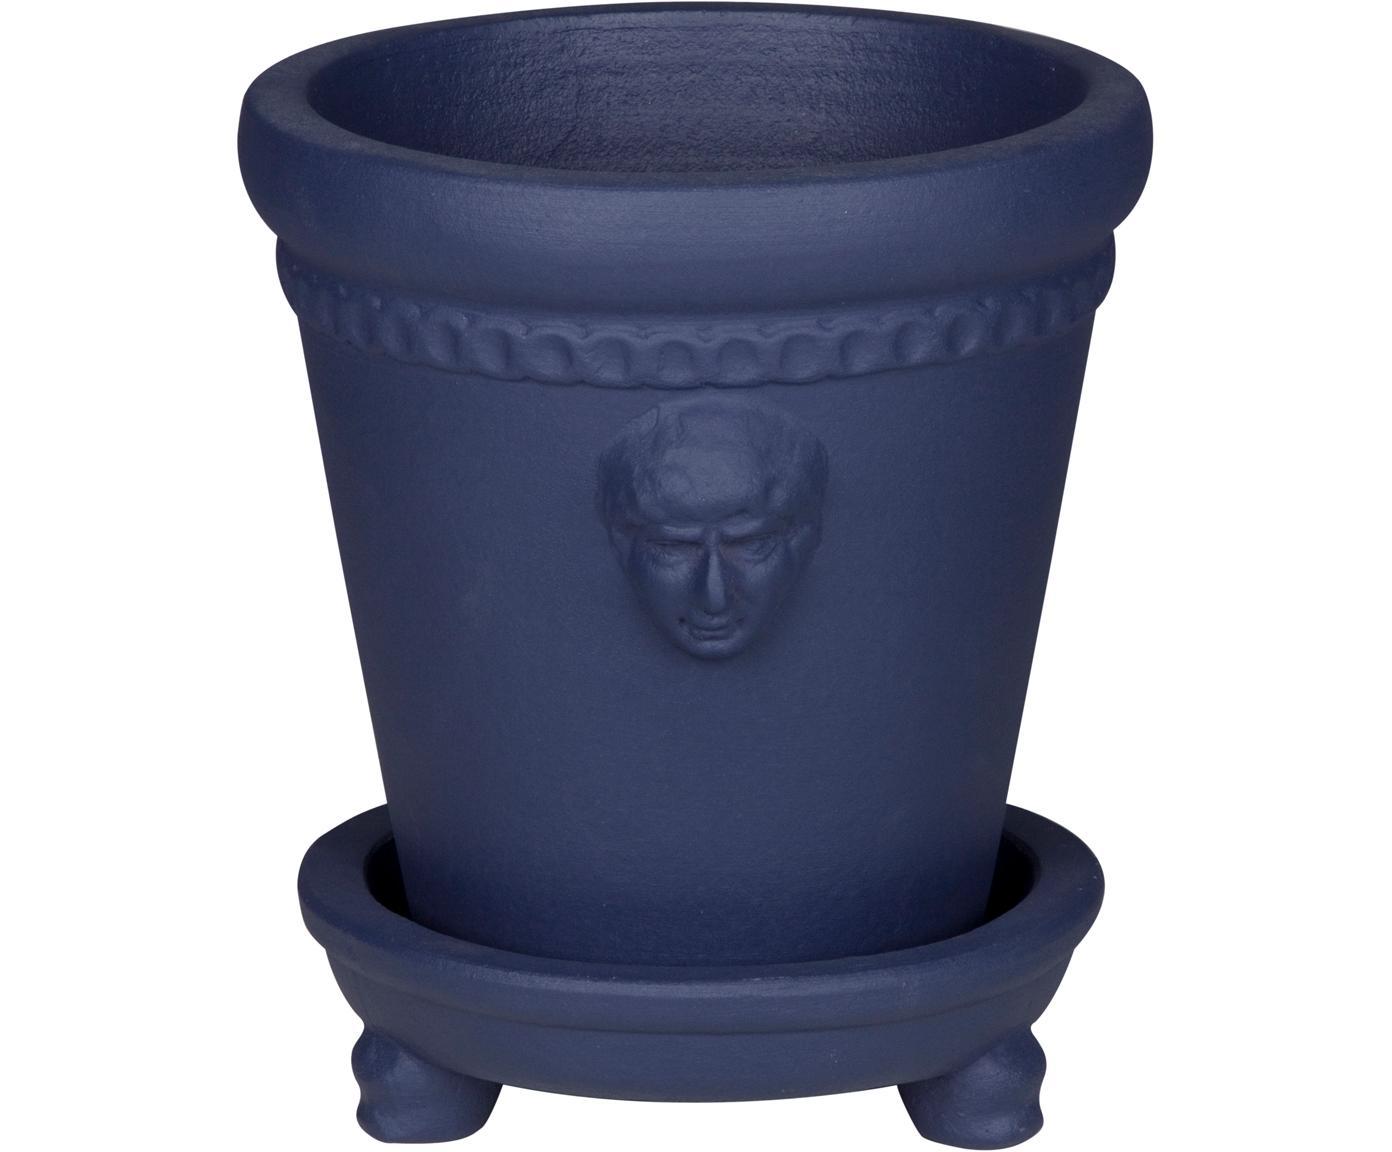 Macetero Ceasar, Terracota, Azul, Ø 17 x Al 20 cm